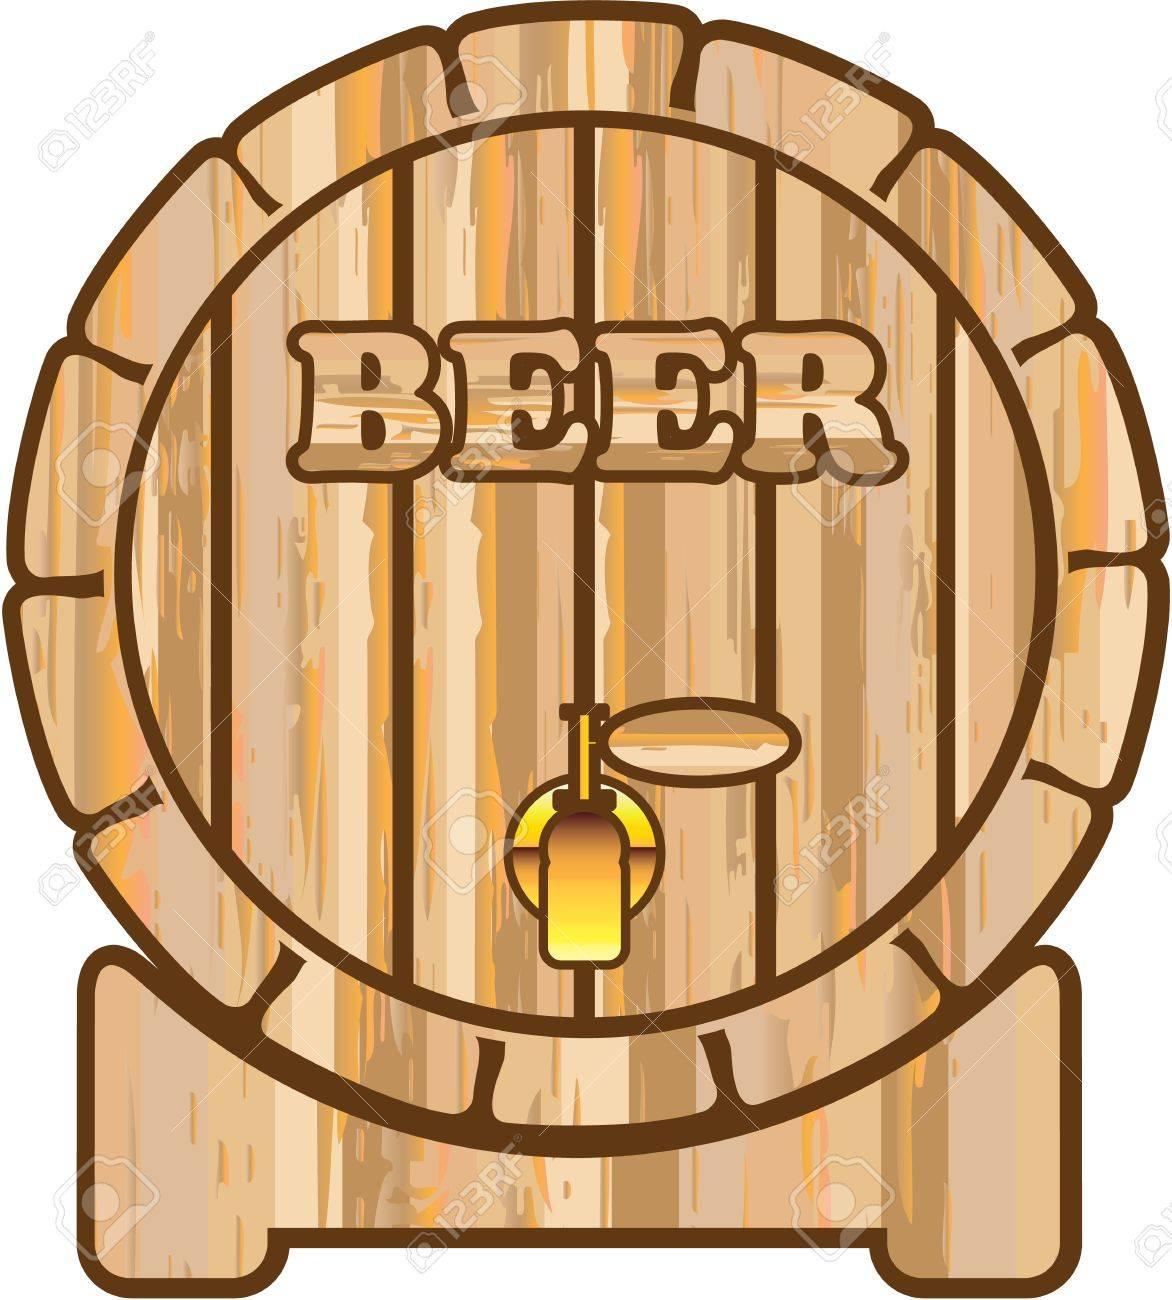 beer barrel wooden illustration clip art image royalty free cliparts rh 123rf com oil barrel clip art oil barrel clip art